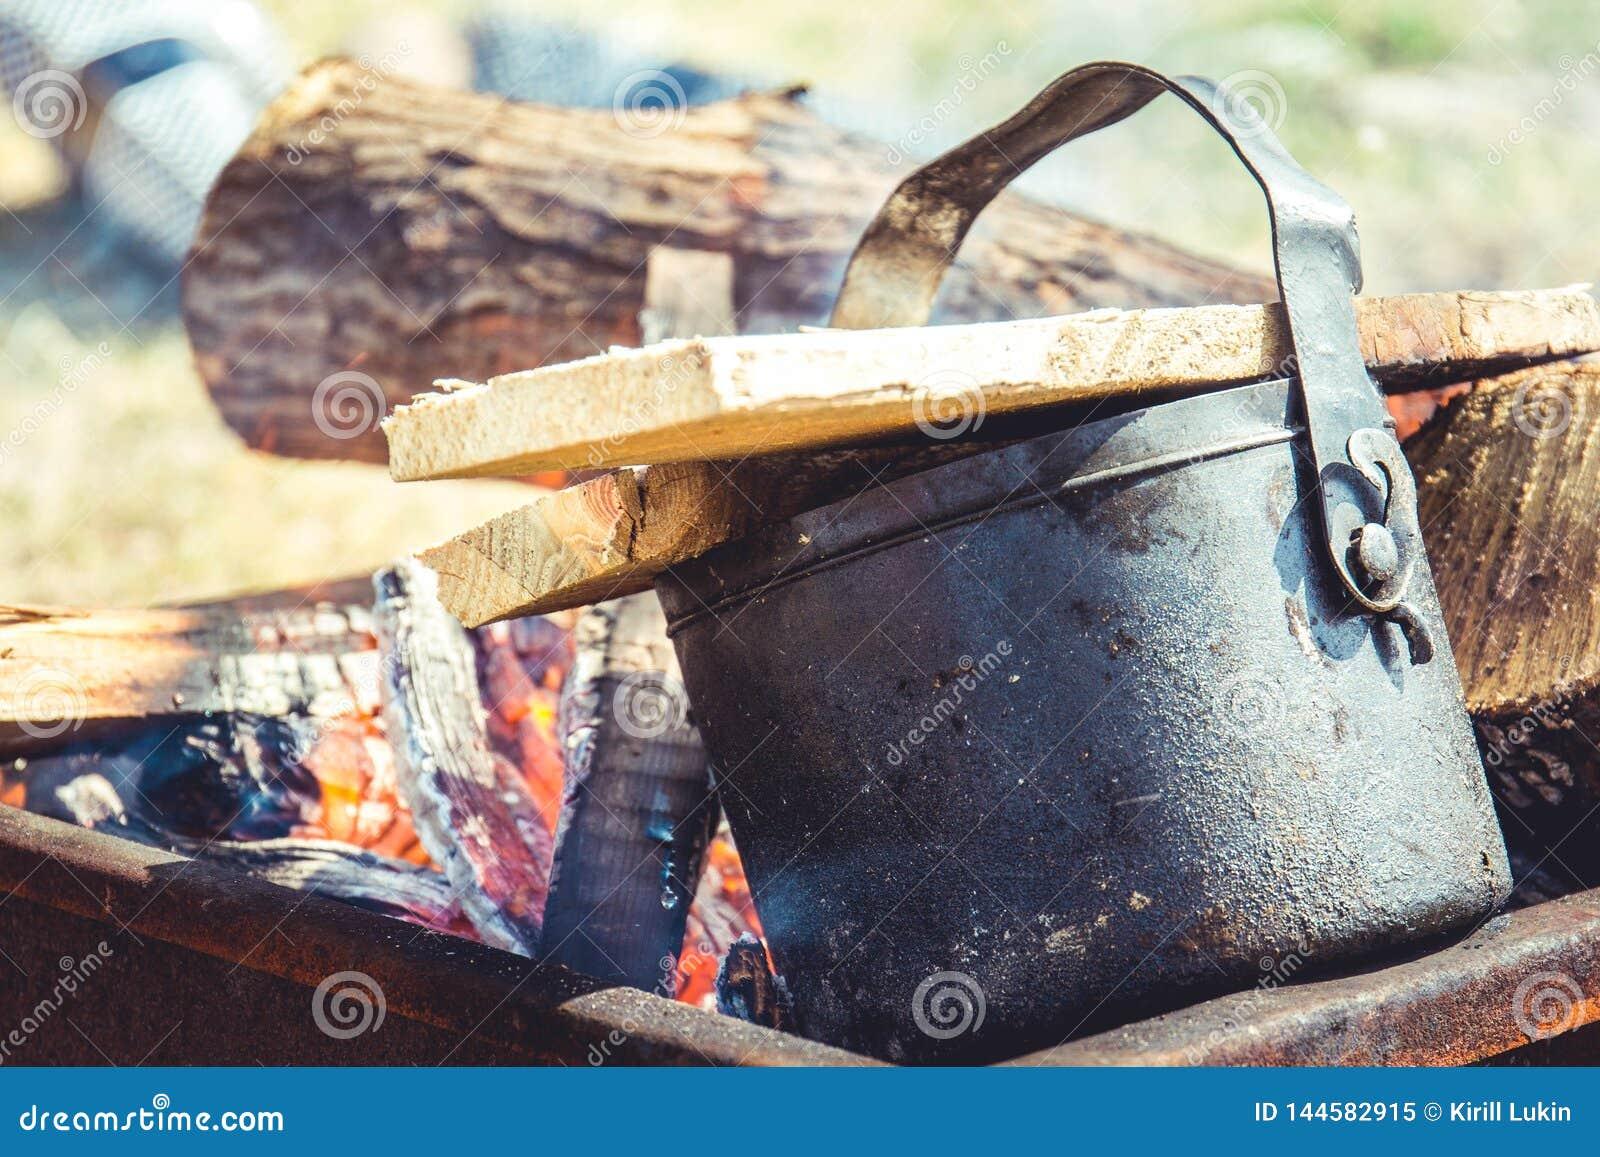 Tea brewing on a fire